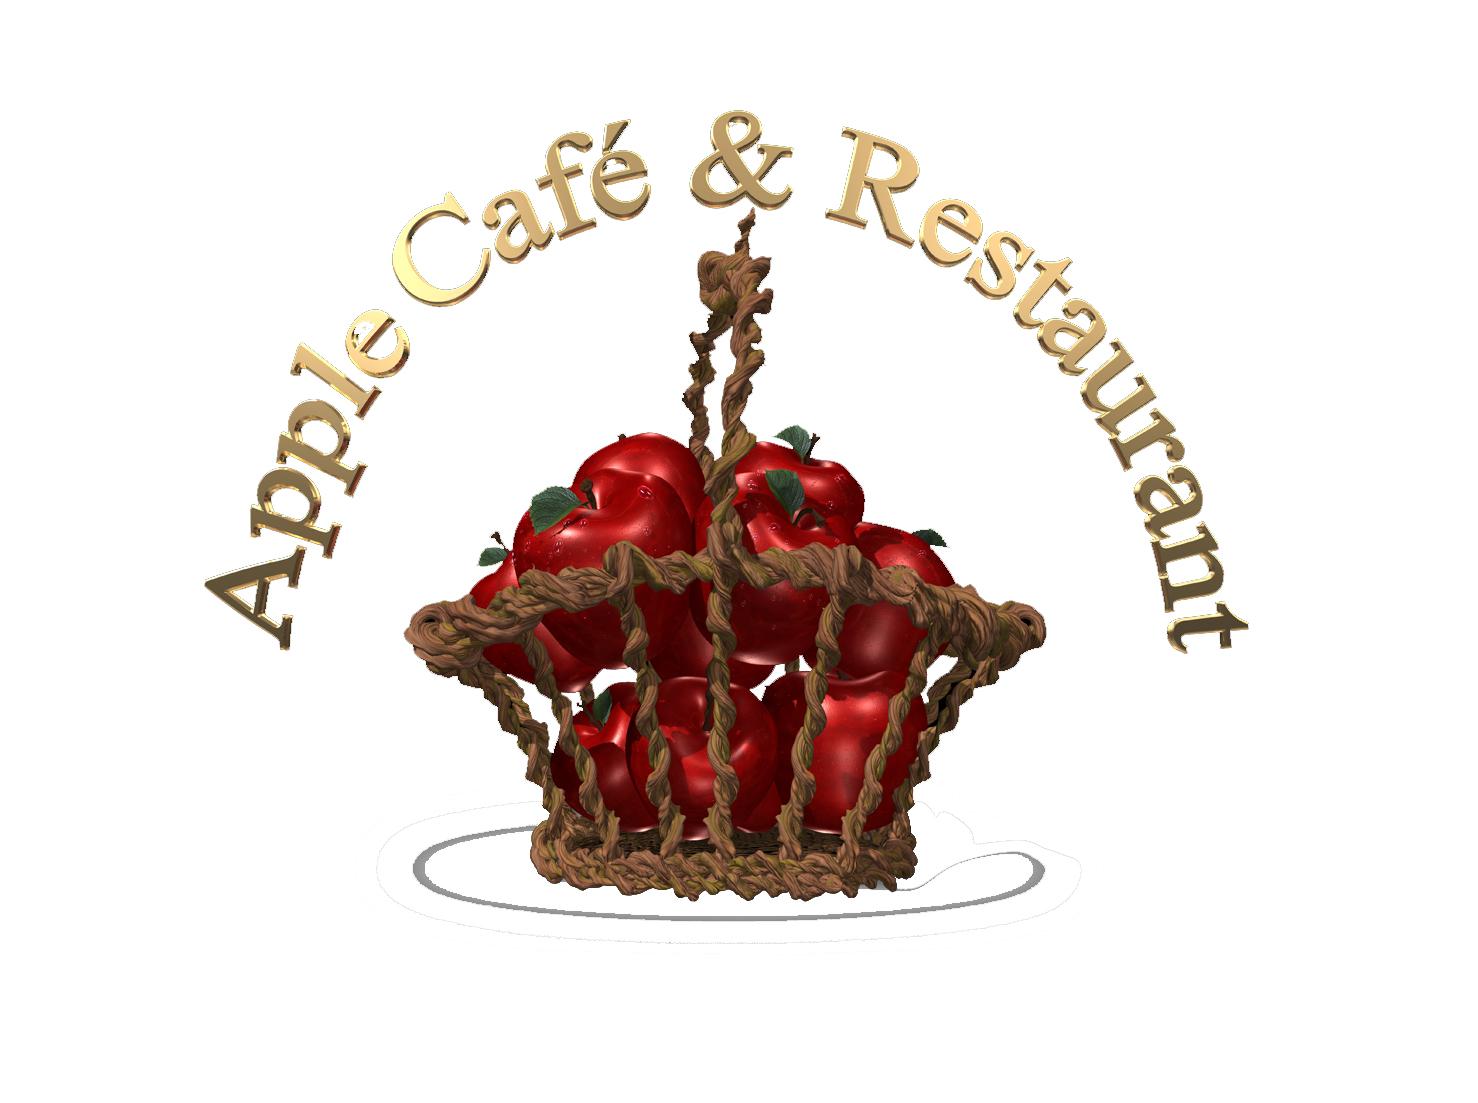 APPLE CREEK CAFE & RESTAURANT